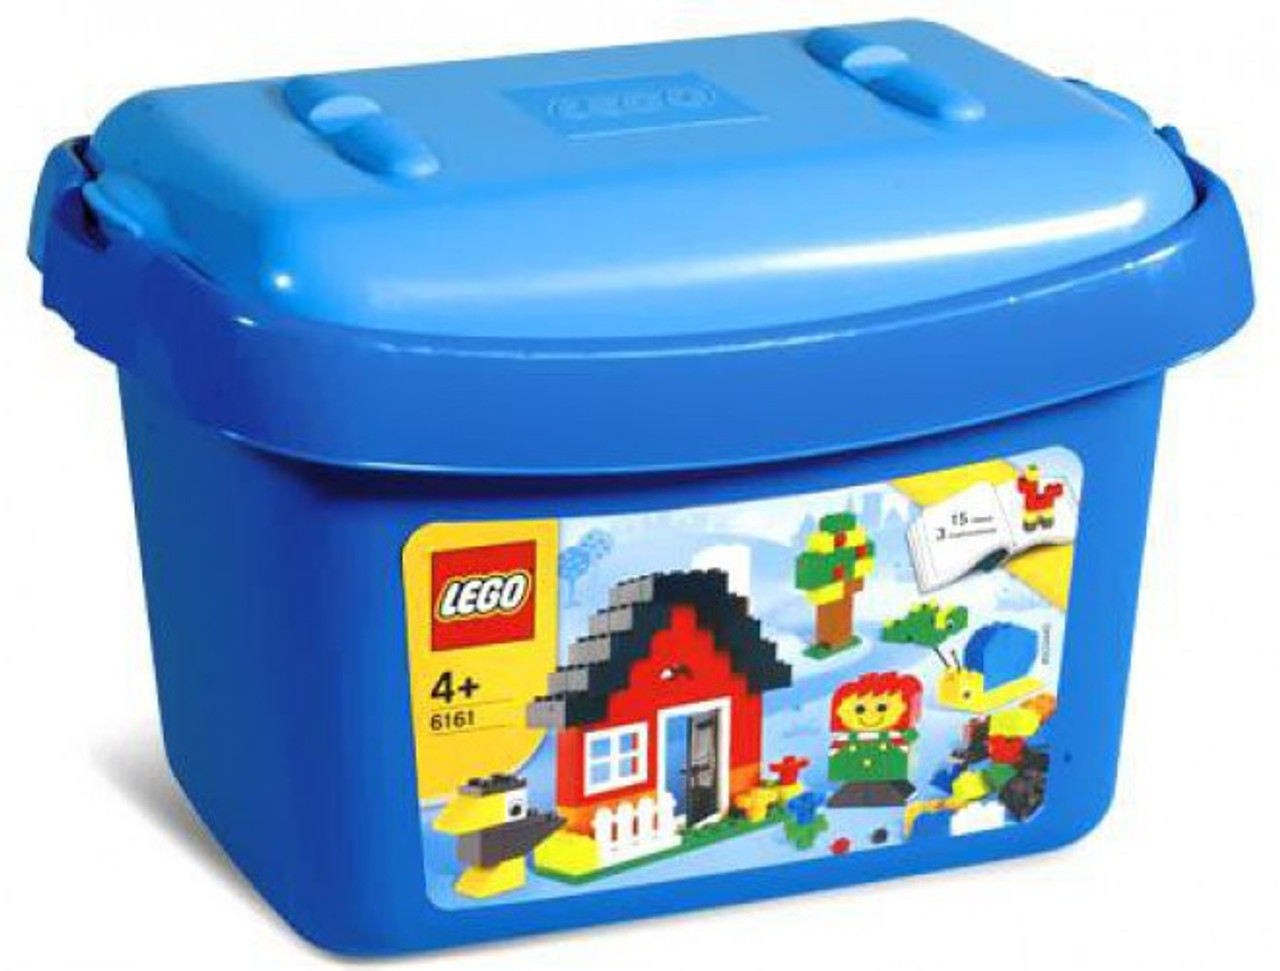 LEGO Small Blue Brick Box Set #6161